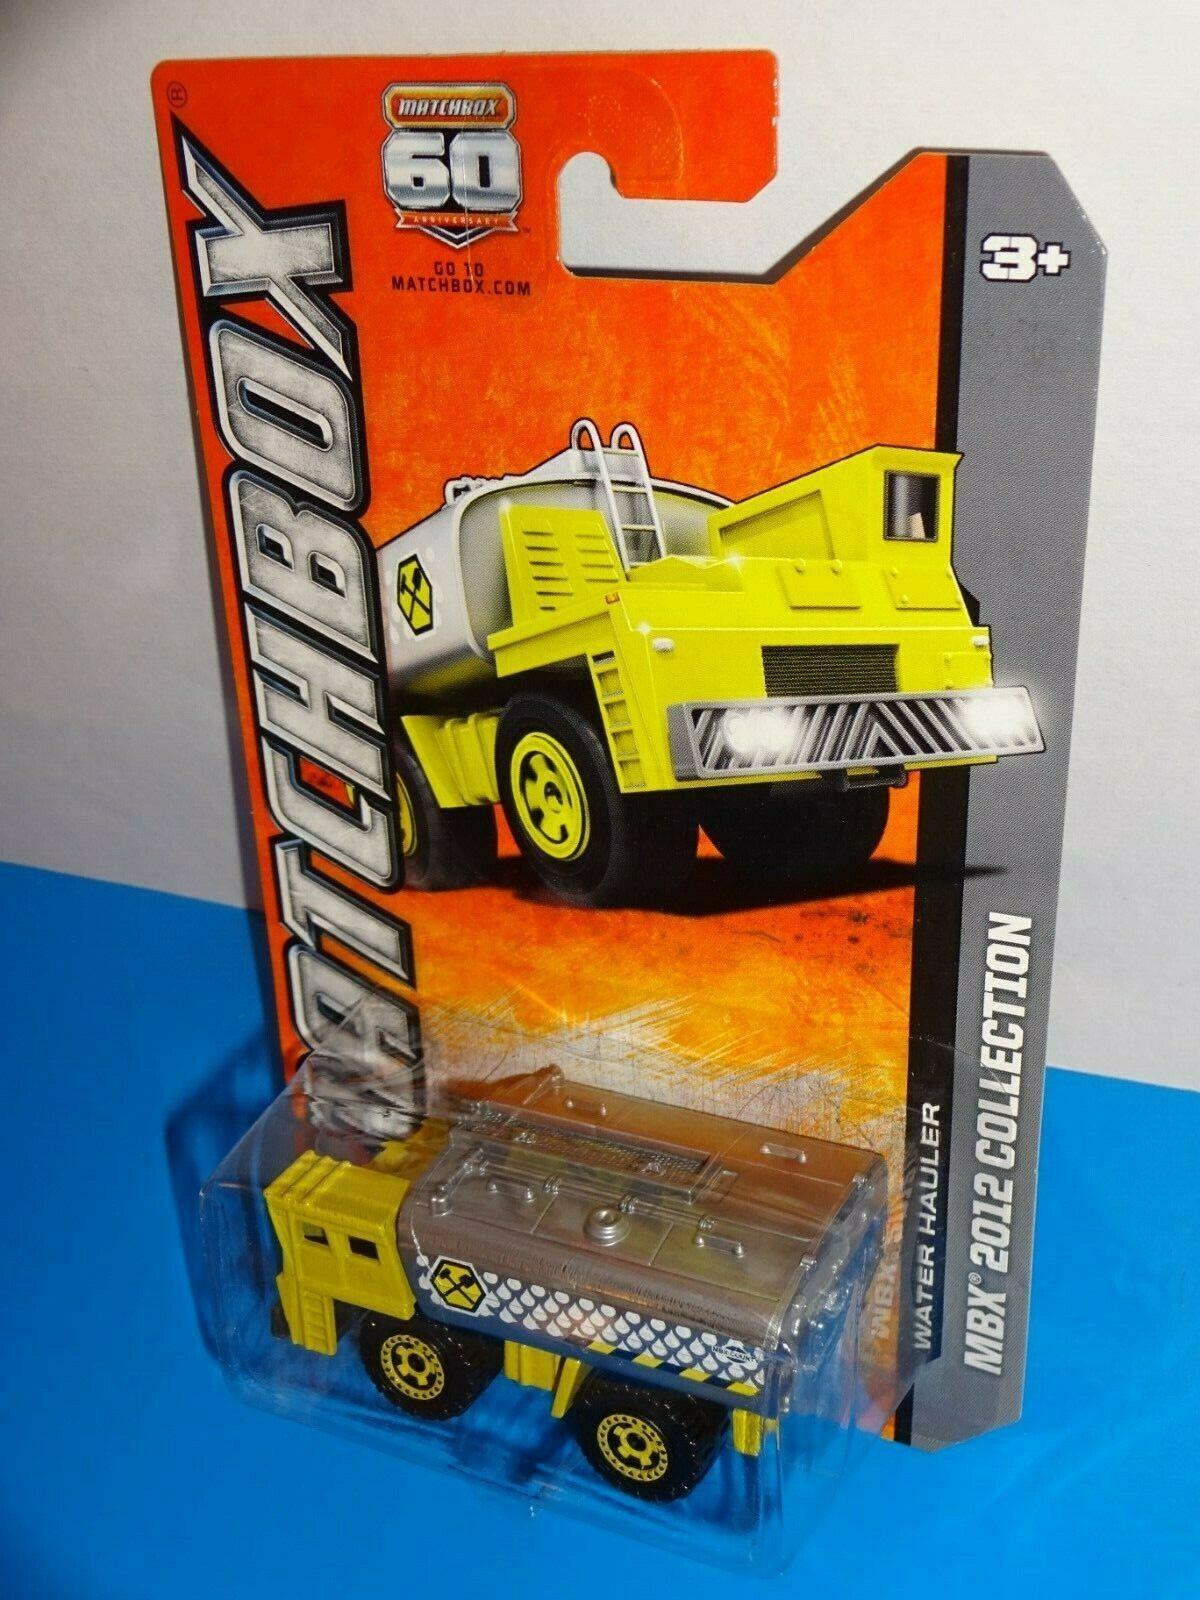 Matchbox 2012 Collection #34 Water Hauler Tank Truck Yellow & Gray